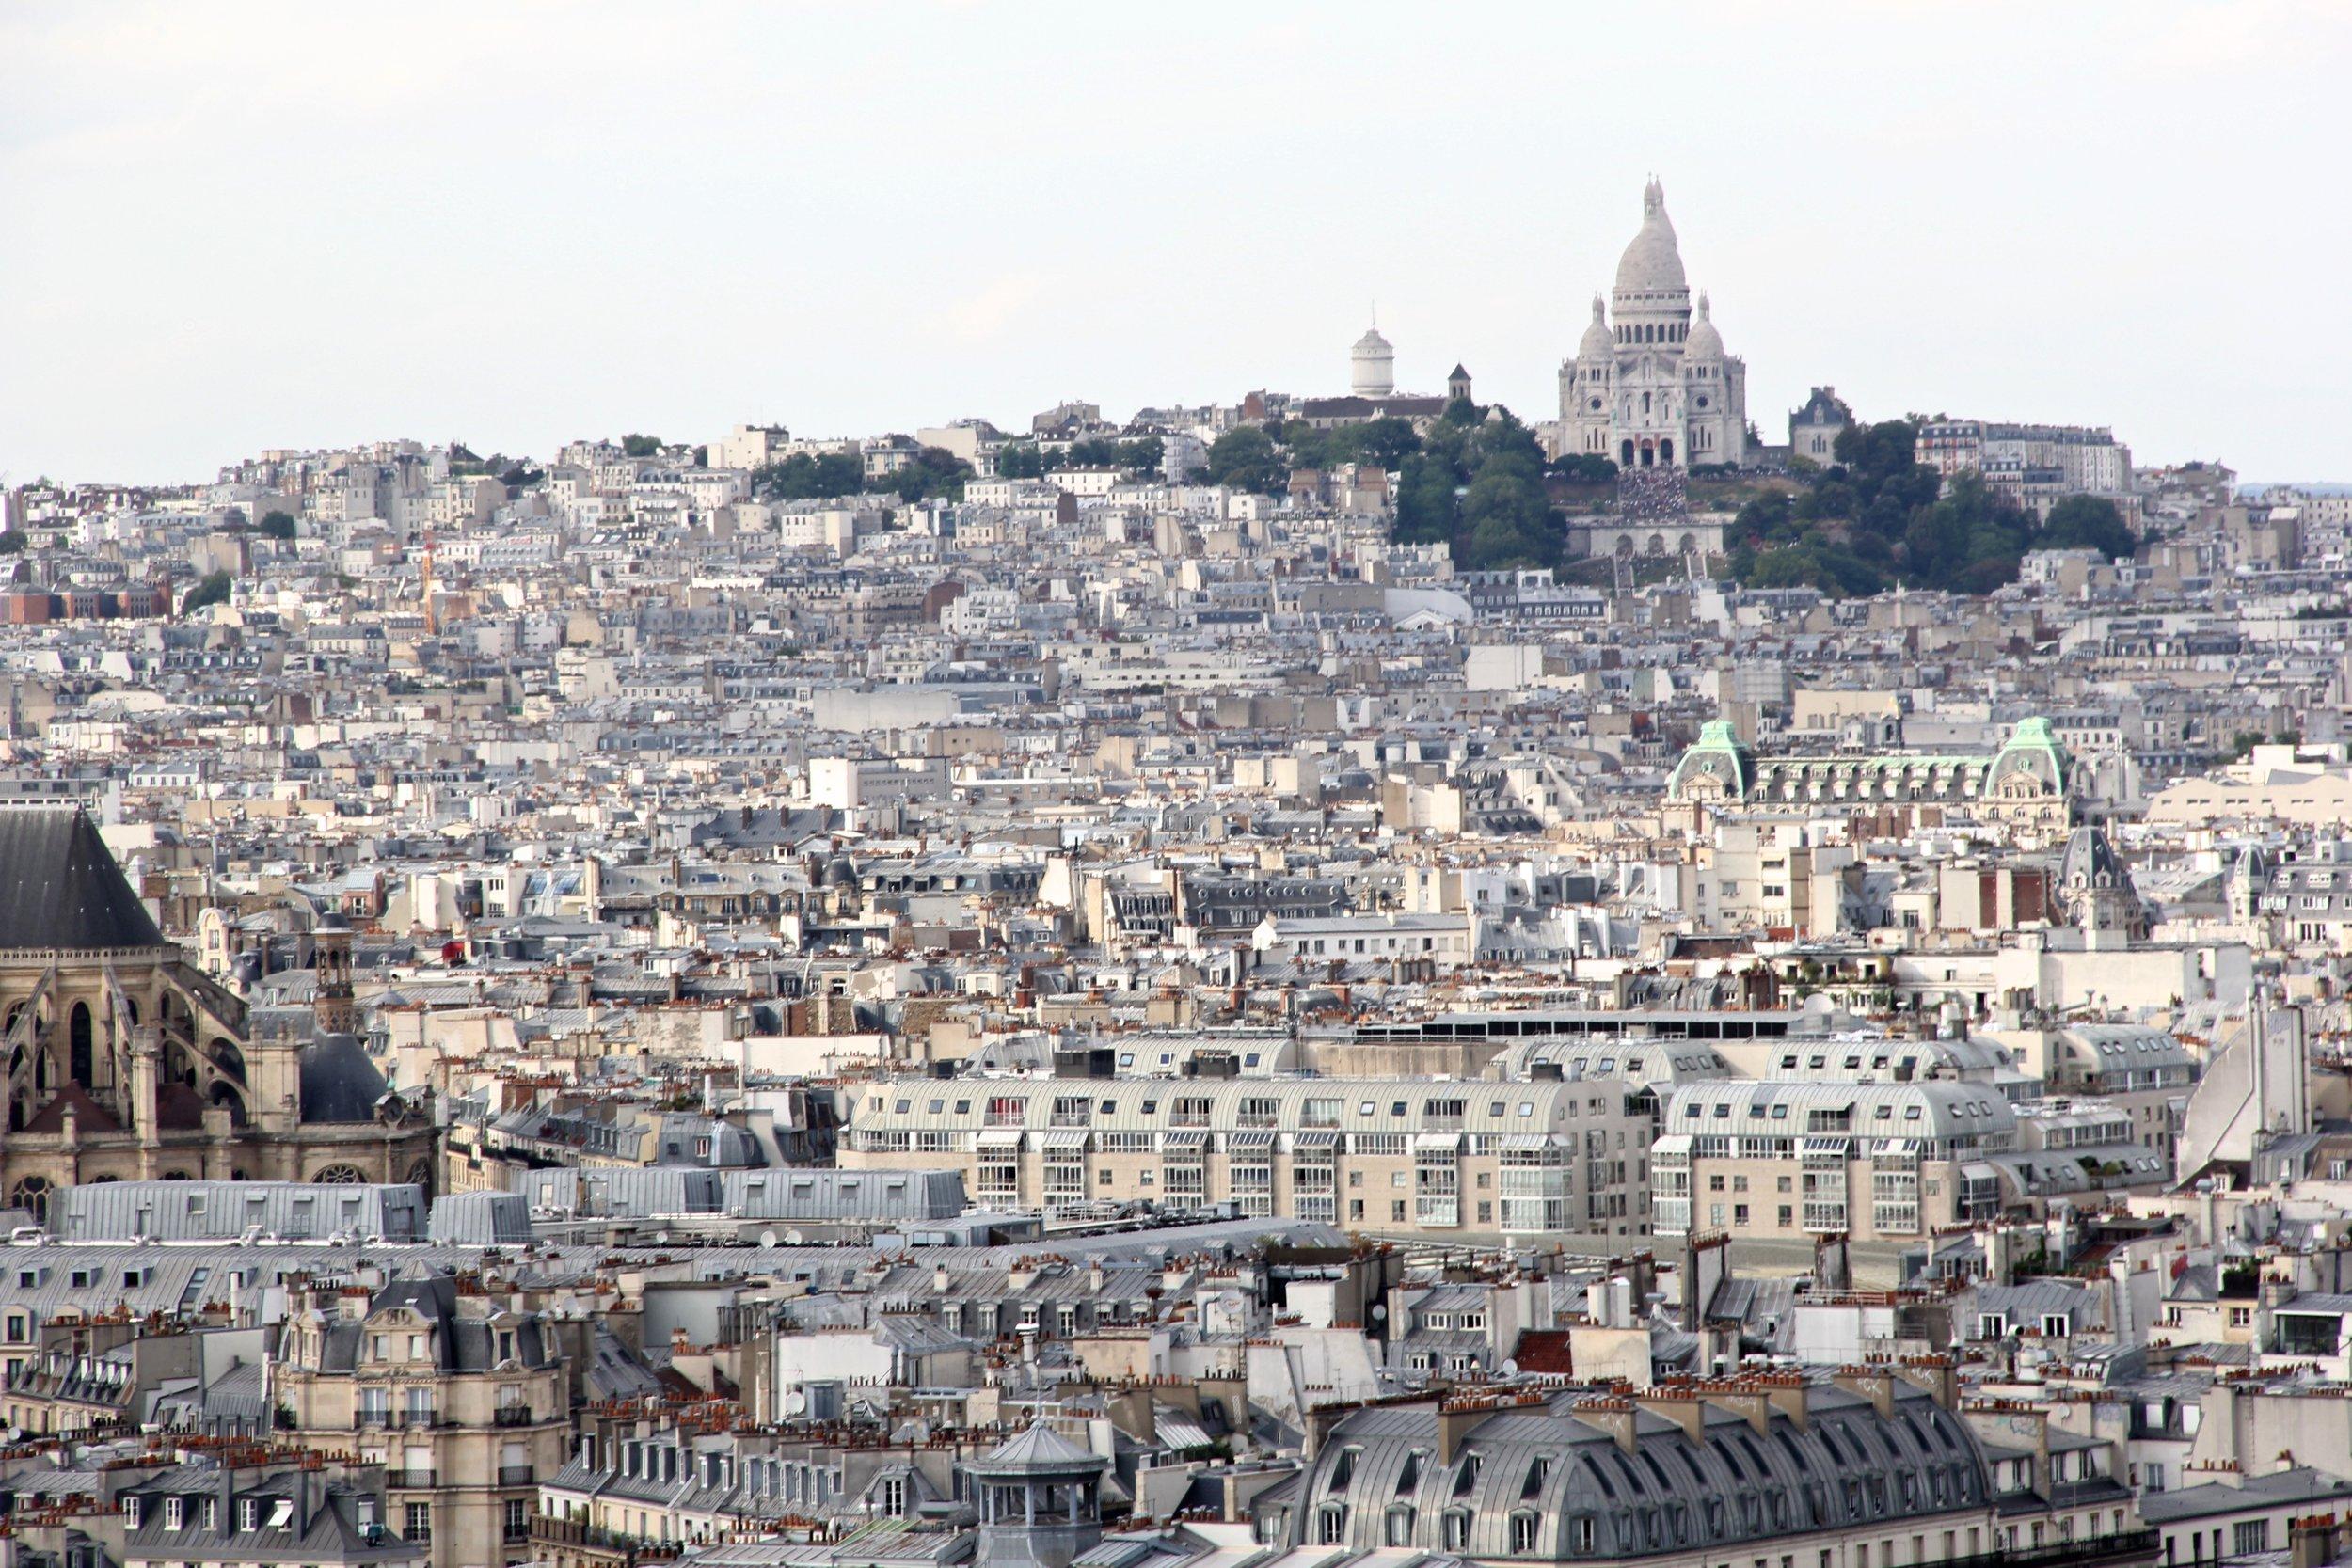 2016.09 Paris Edited 8417.jpg